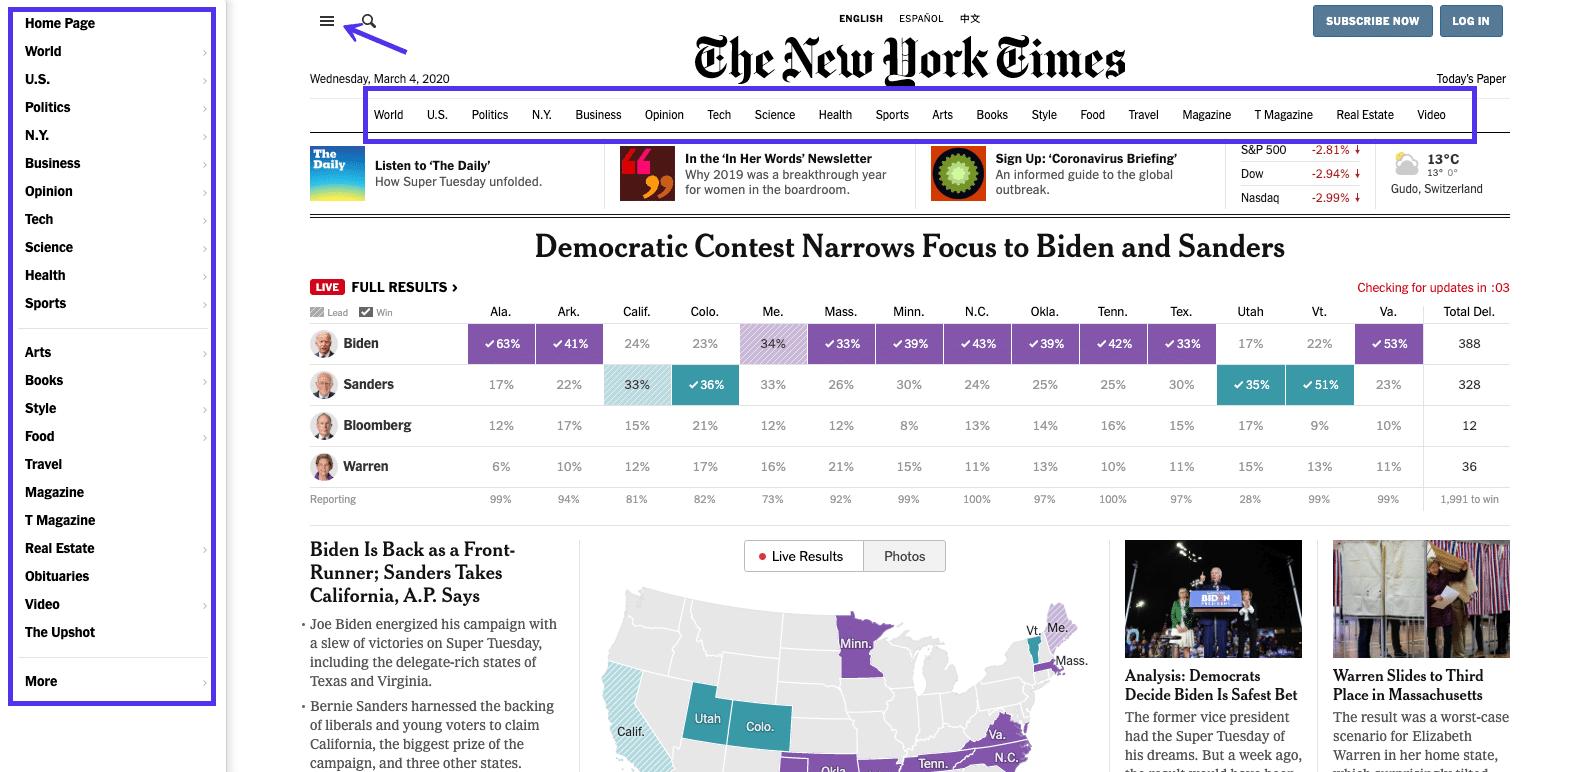 NYT-Startseite - Header-Menüs